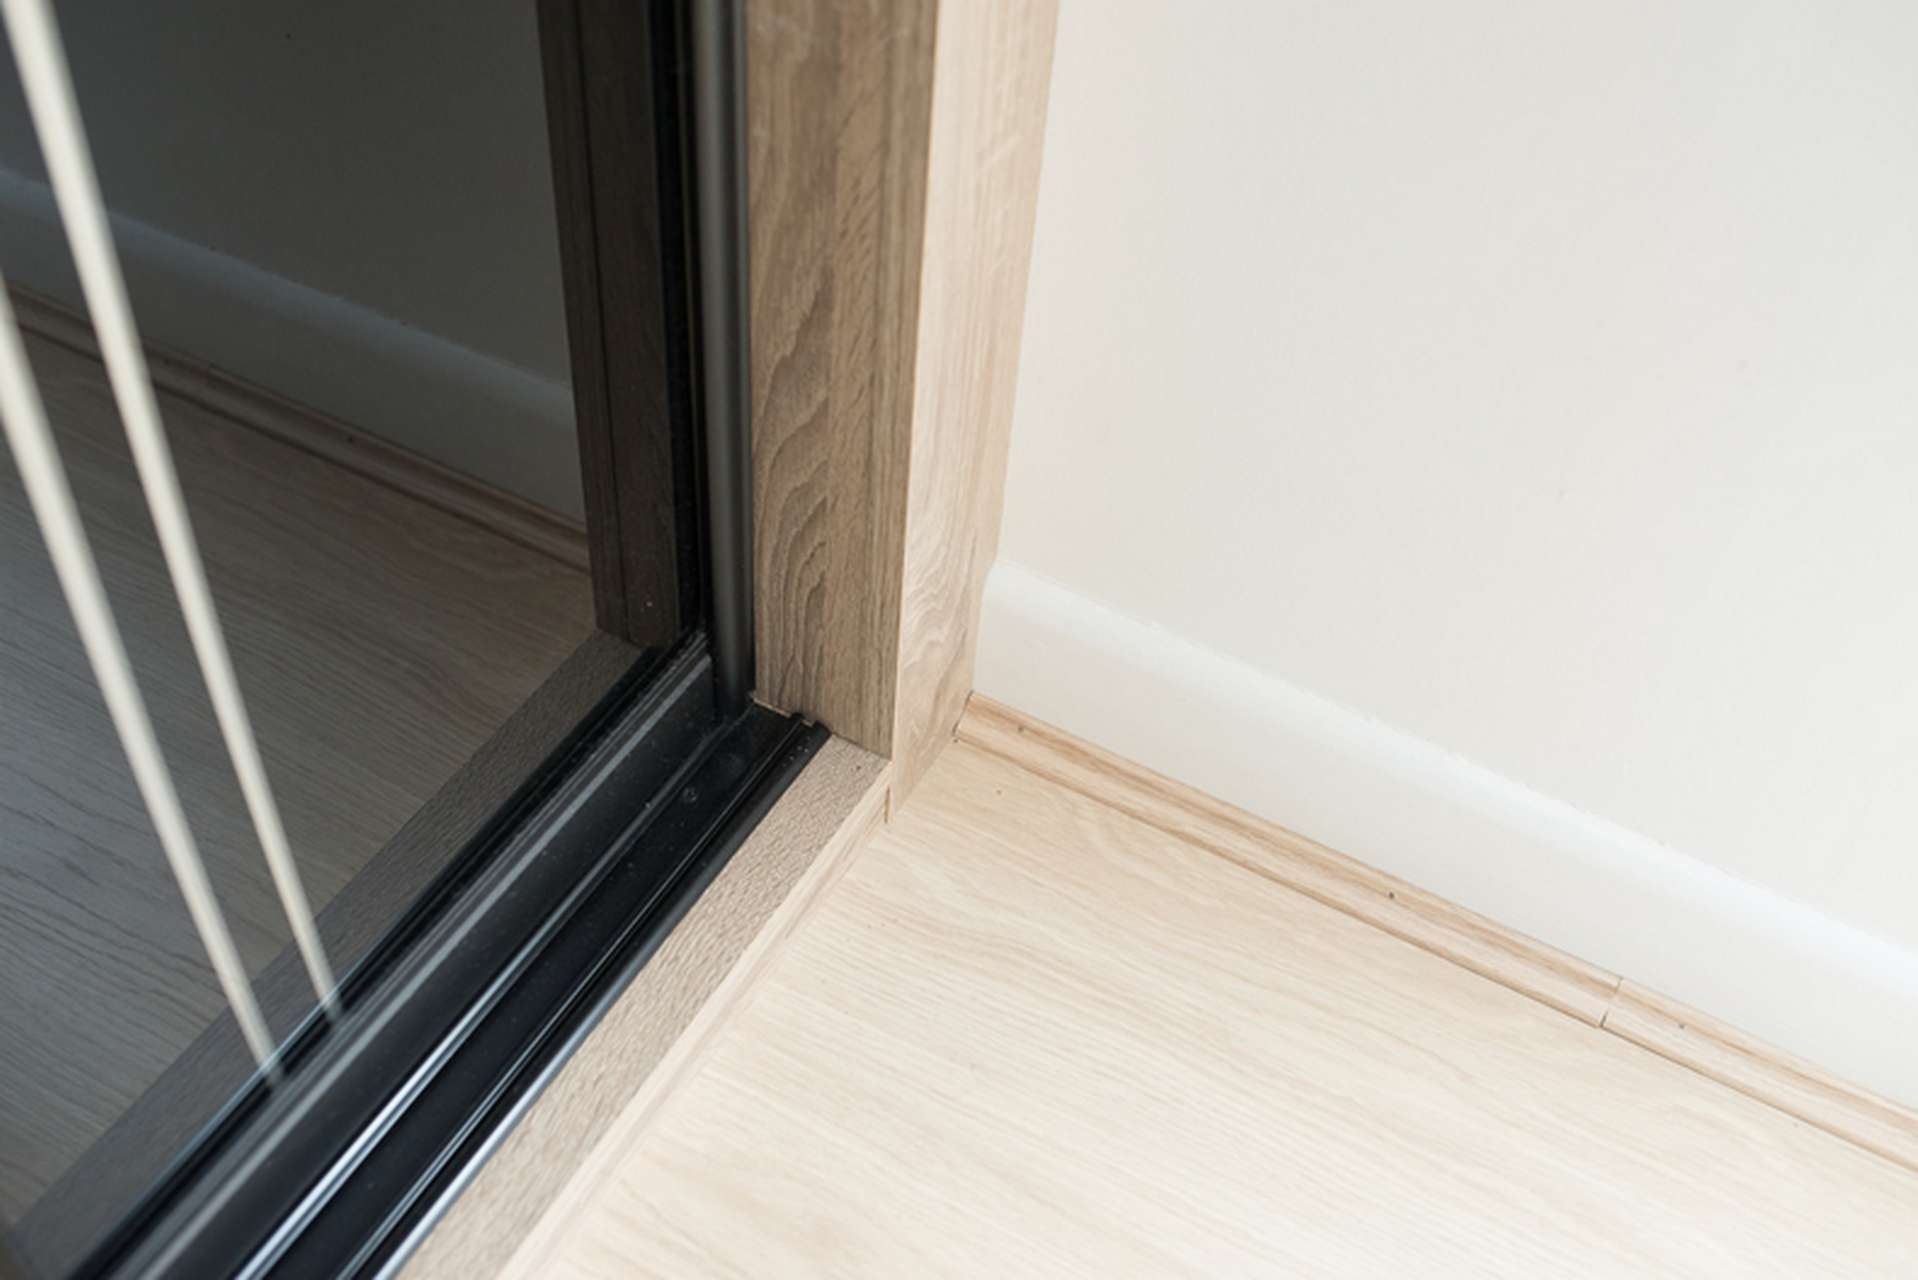 Close up of sliding wardrobe plinth and track